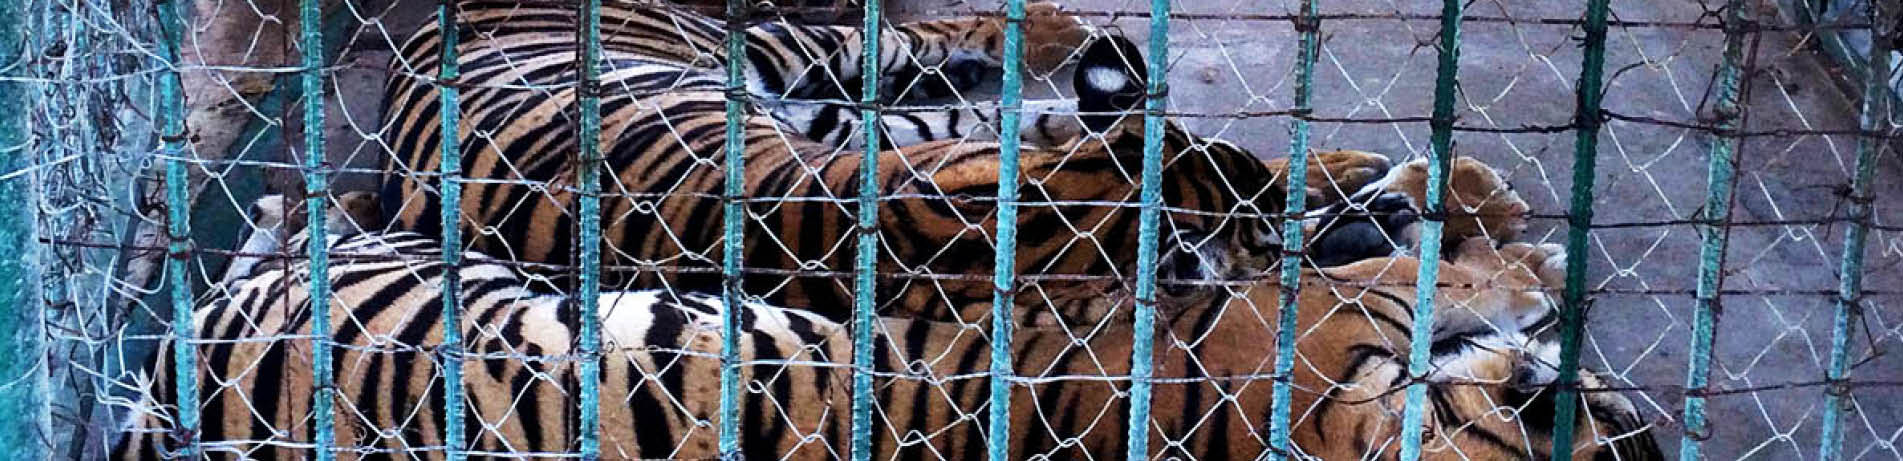 Captive tigers behind fence, China